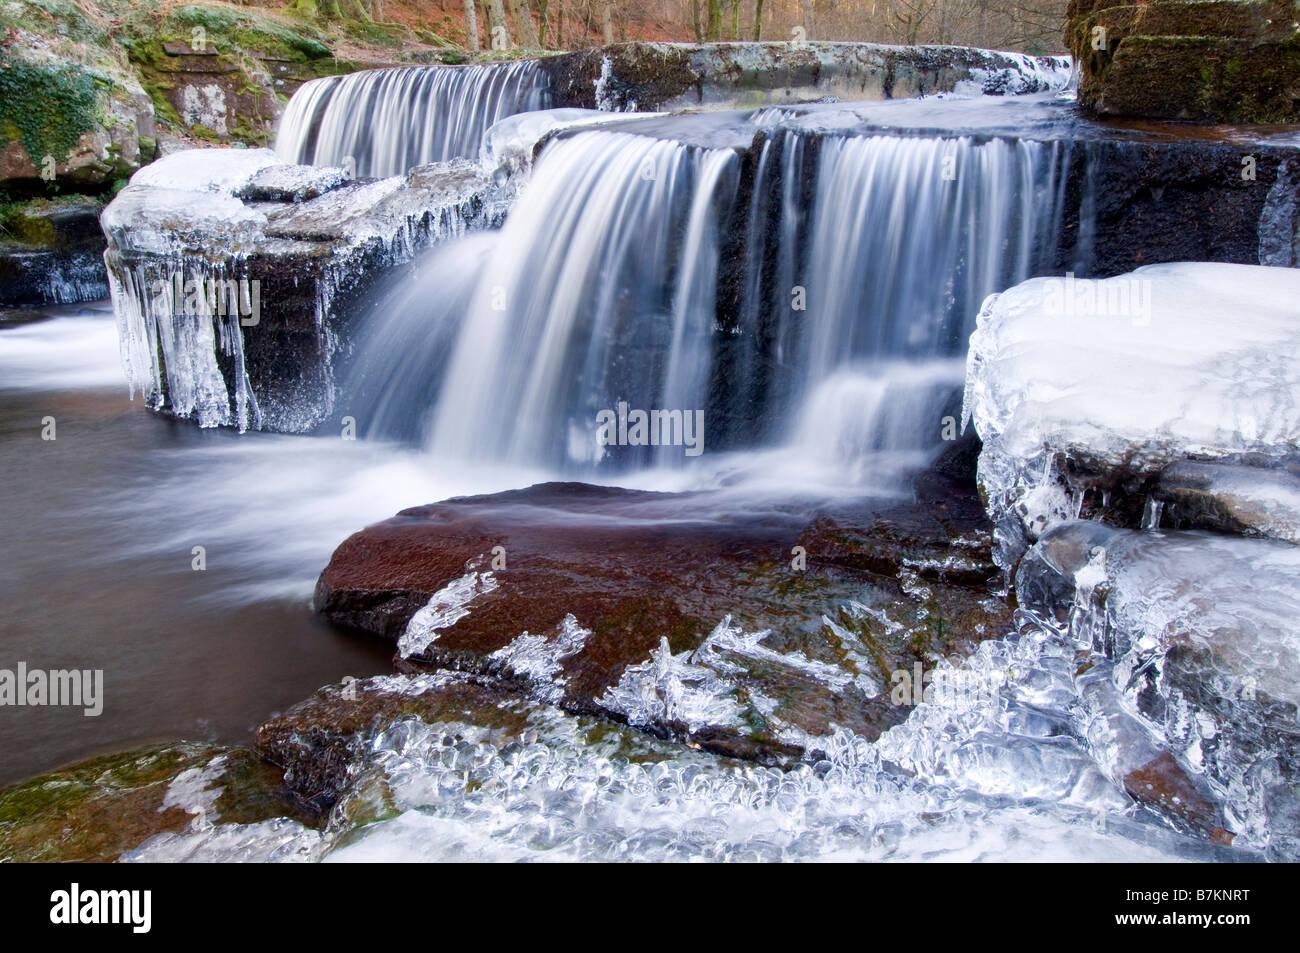 Waterfall on the Taf Fechan in winter. Stock Photo